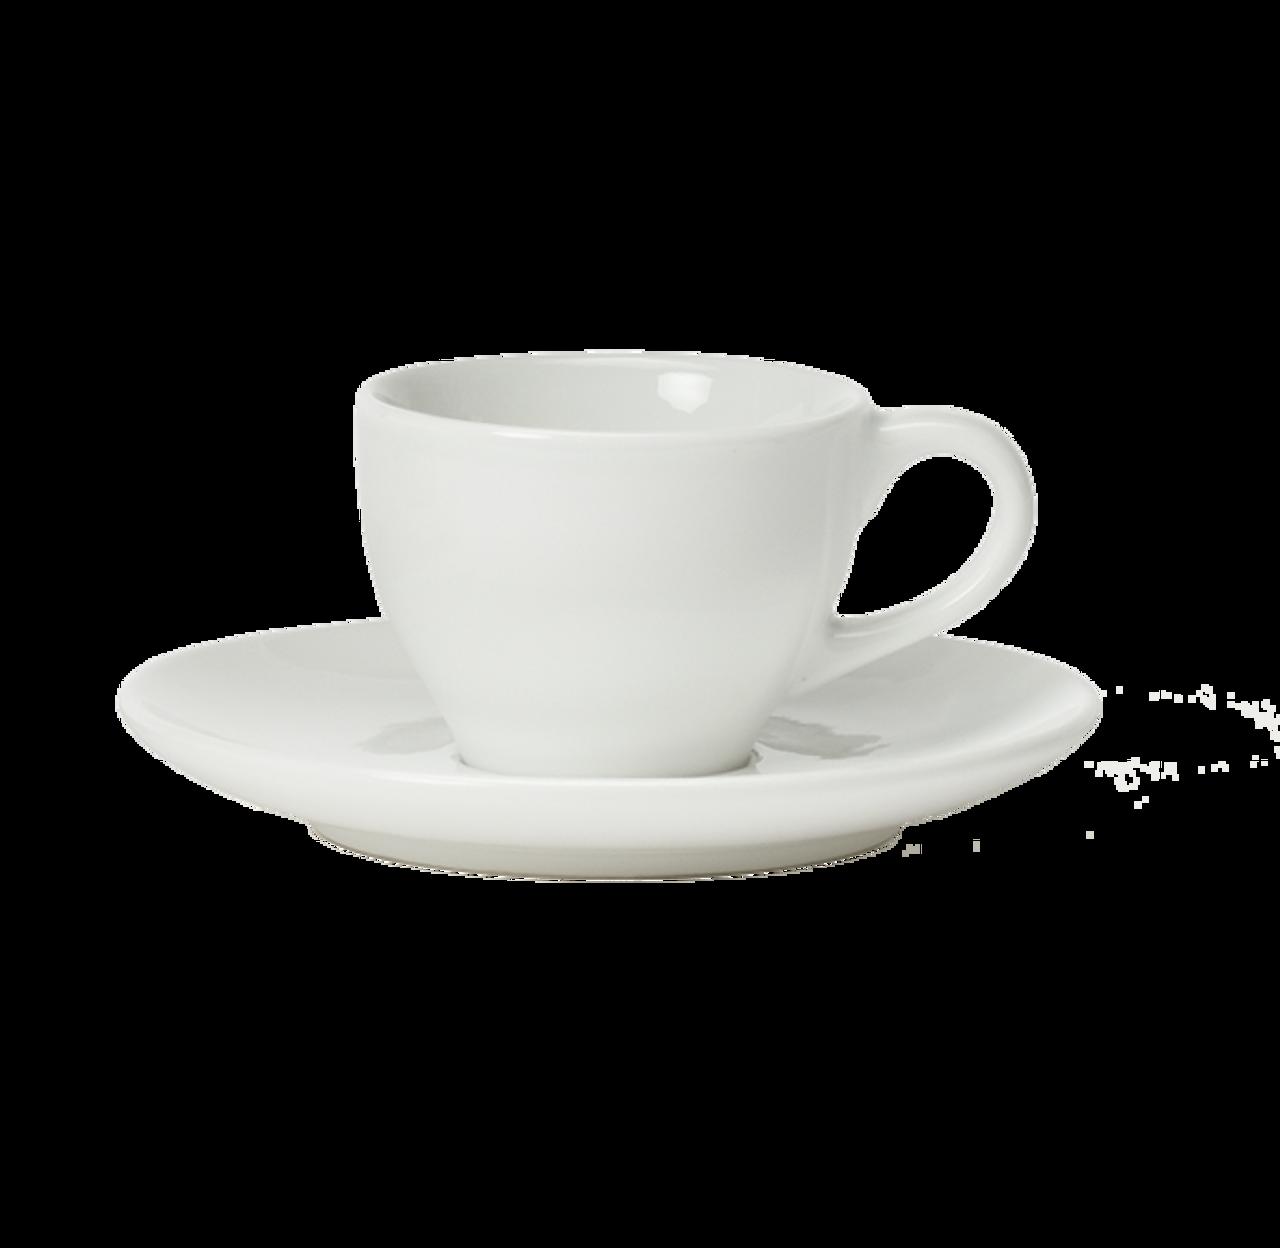 Revolution Demitasse Cup & Saucer